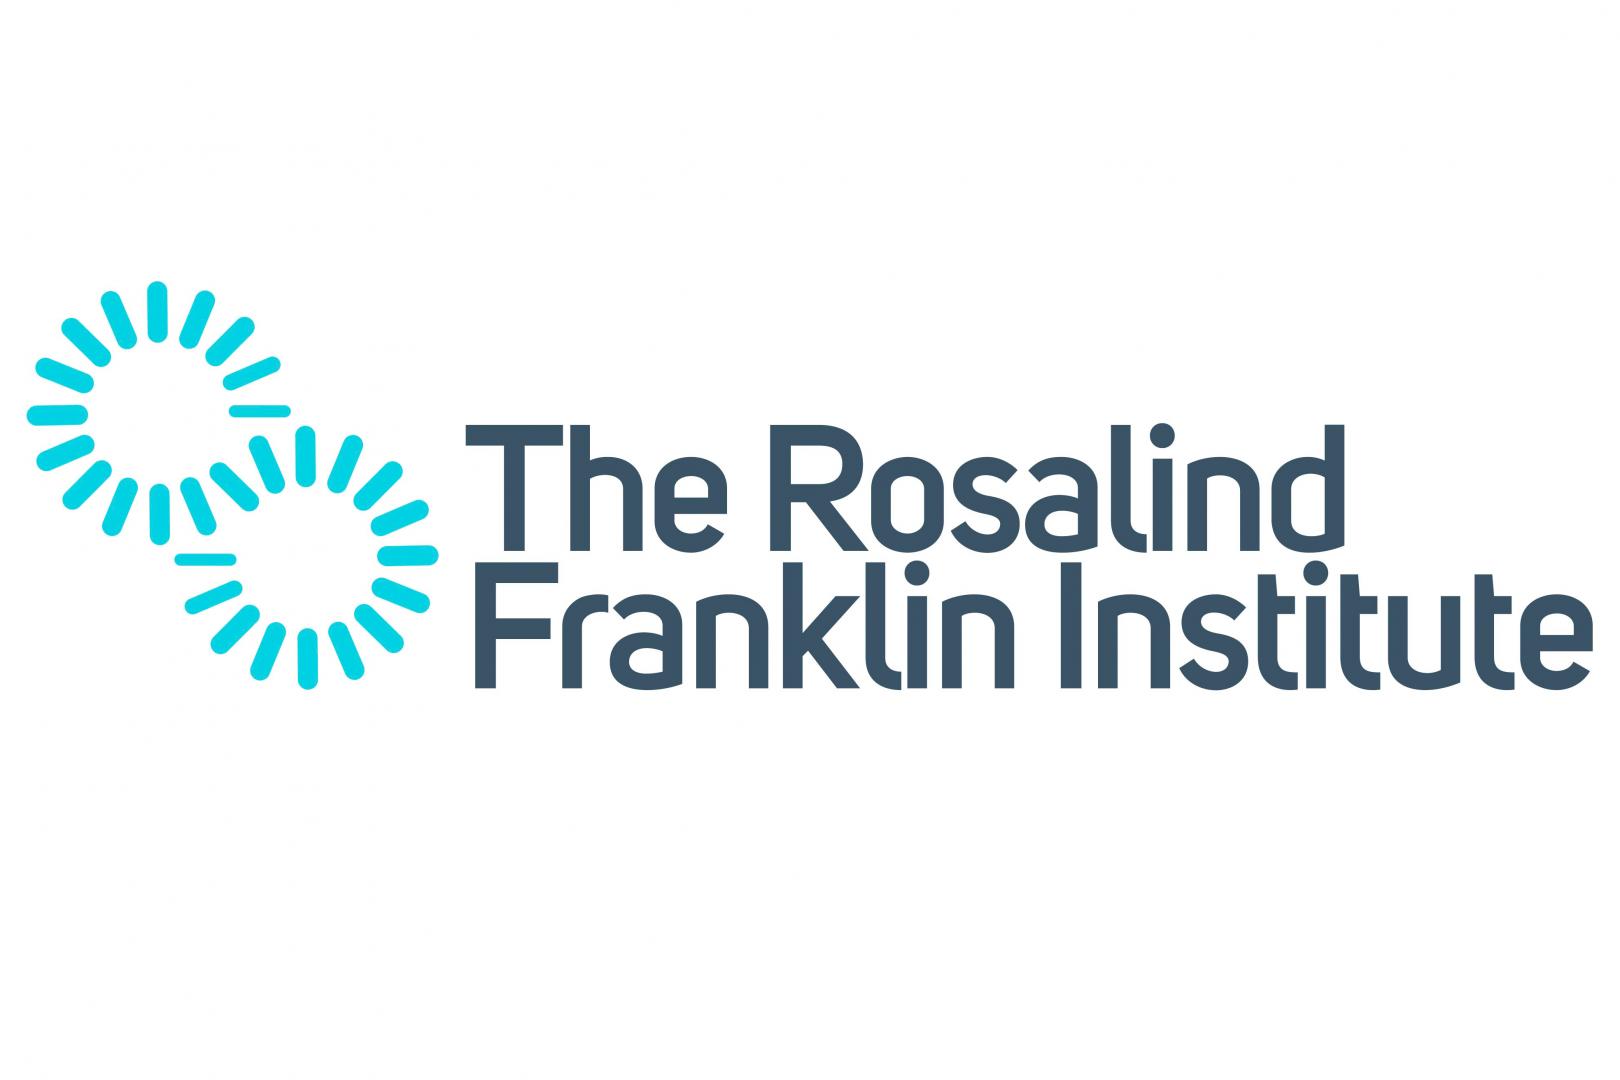 The Rosalind Franklin Institute logo